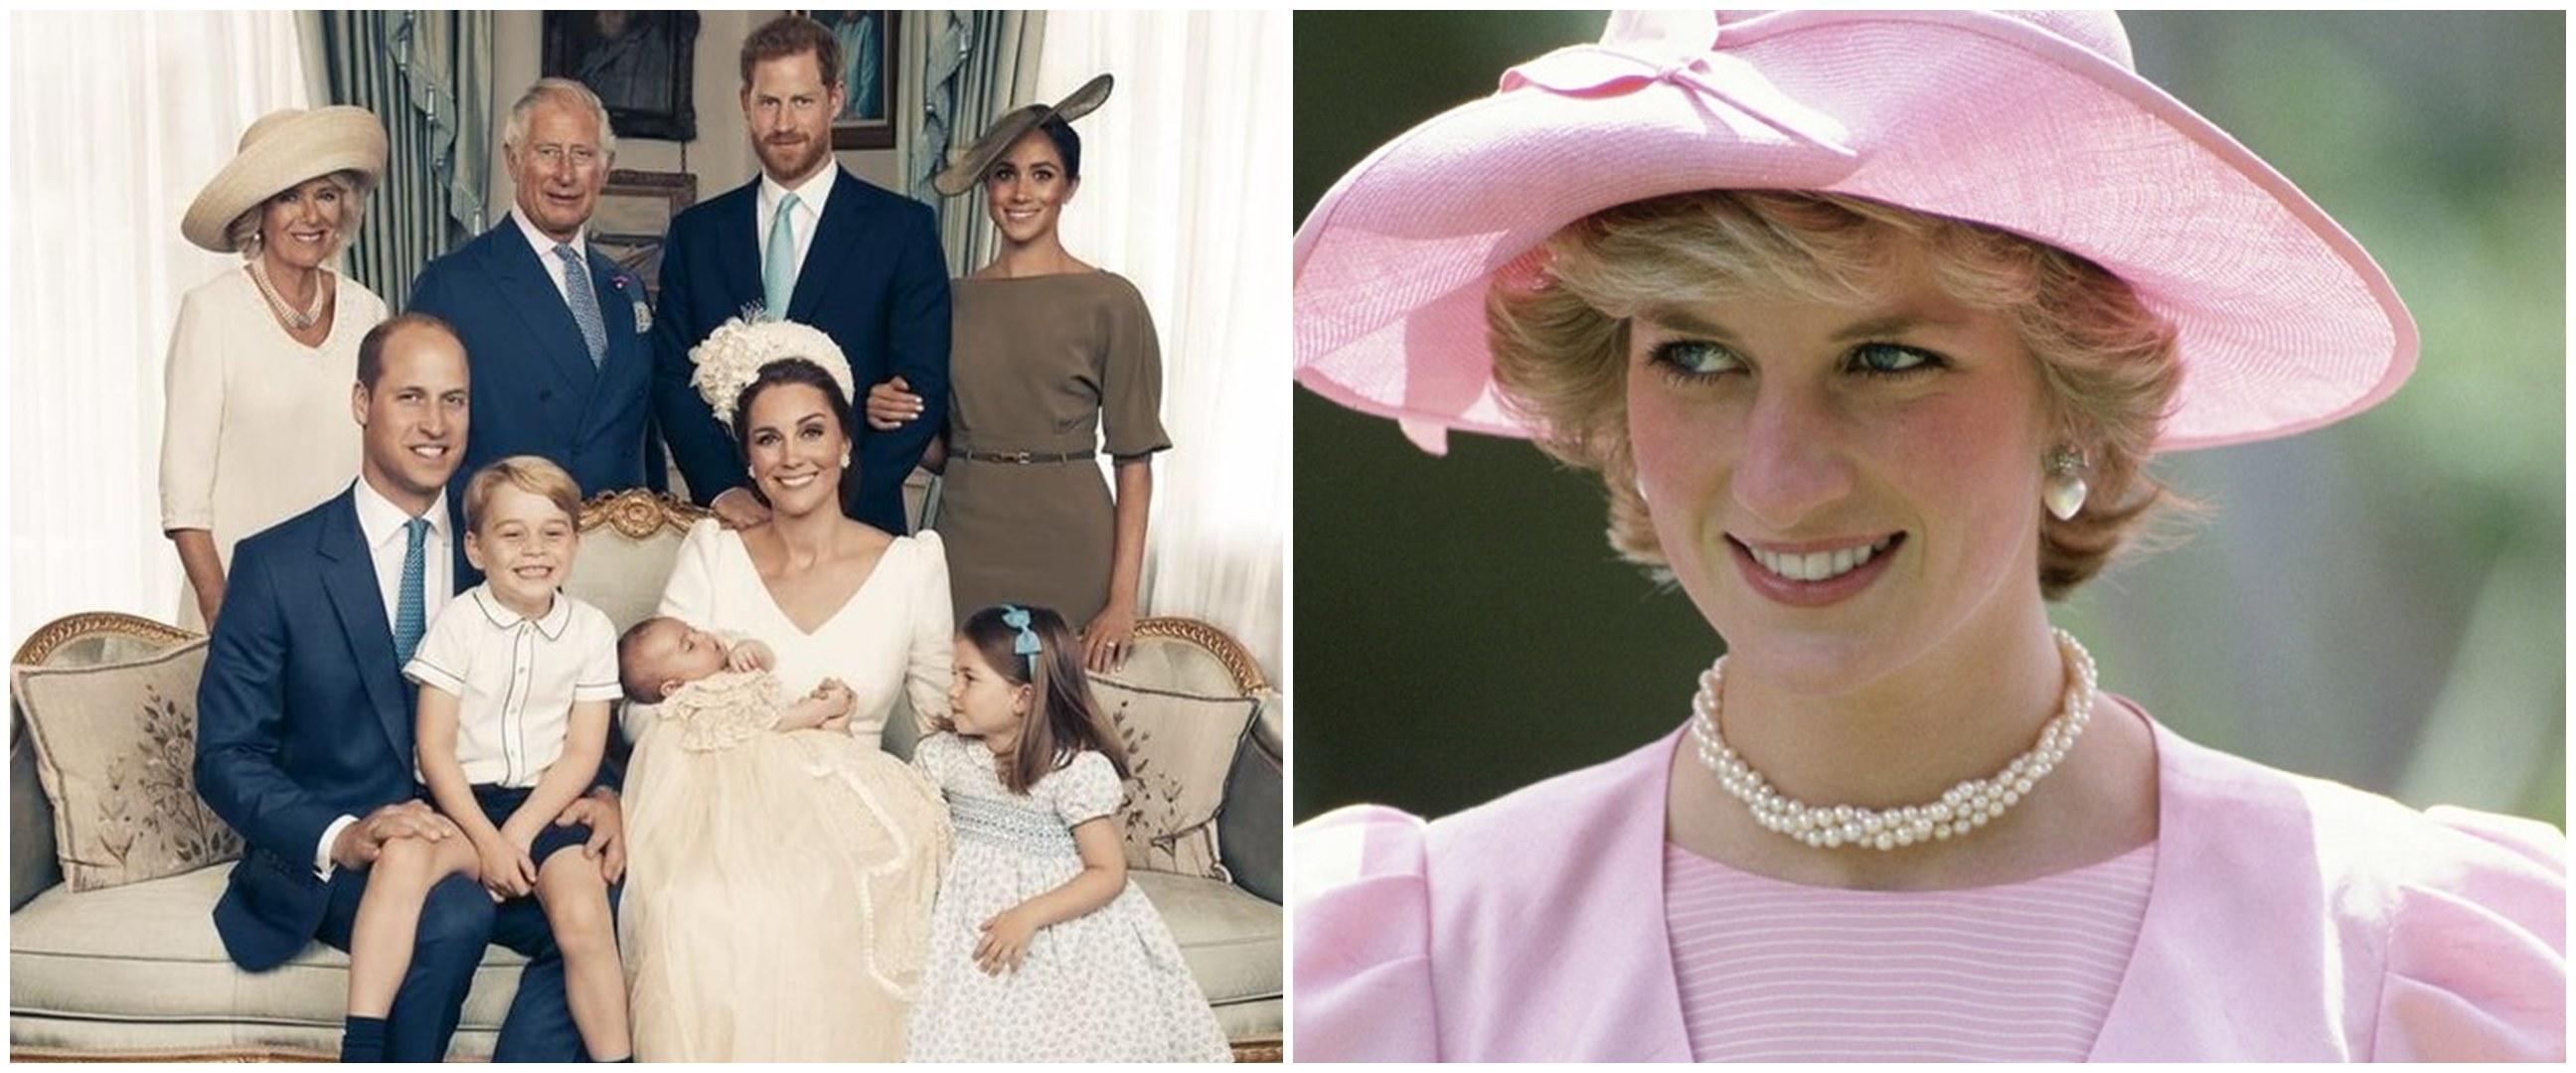 Foto masa kecil 10 anggota kerajaan Inggris, Pangeran William gemesin